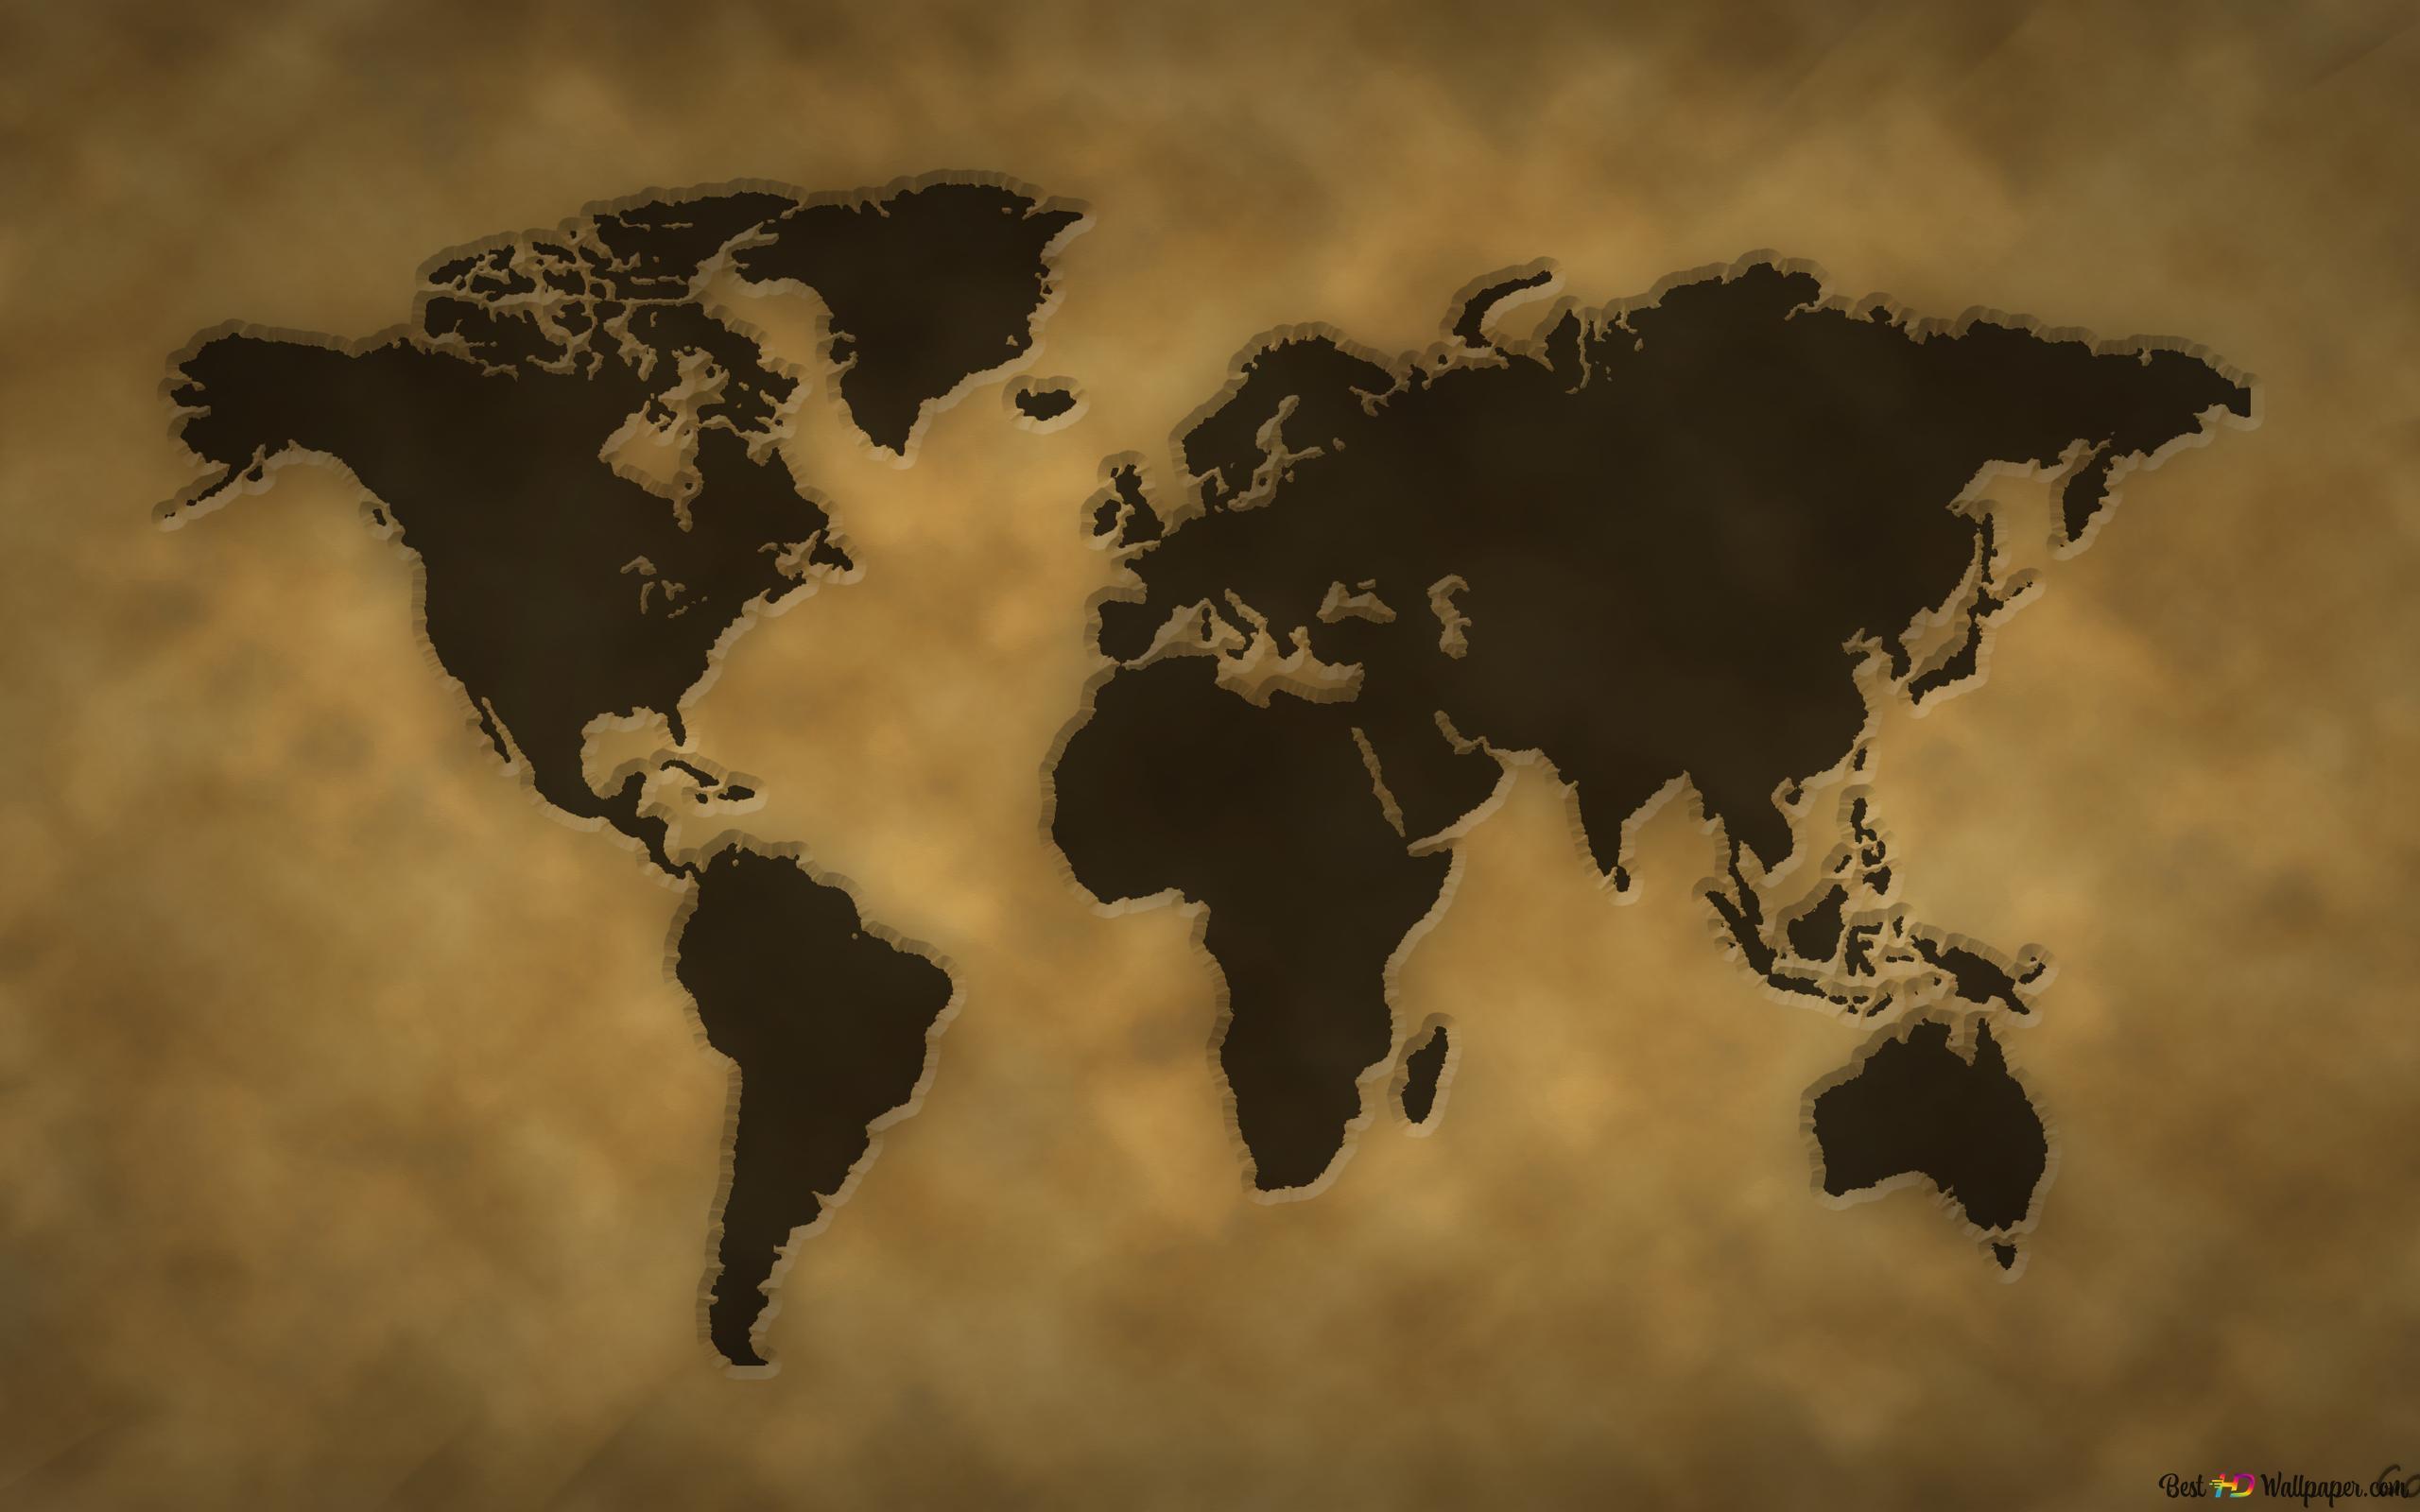 Vintage World Map Hd Wallpaper Download